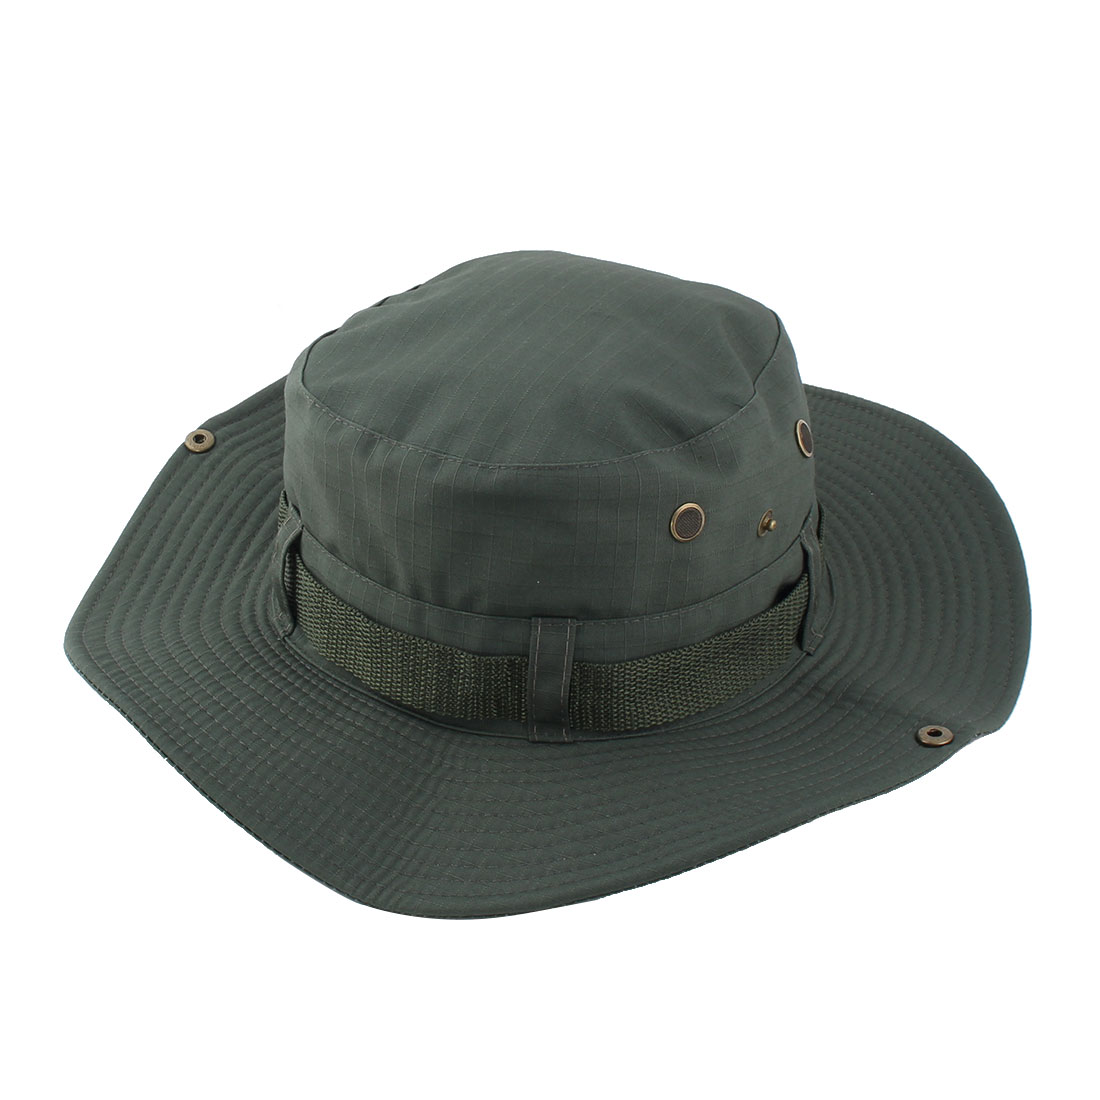 Fisherman Outdoor Sports Hiking Hunting Adjustable Strap Wide Brim Sun Protector Bucket Summer Cap Fishing Hat Army Green